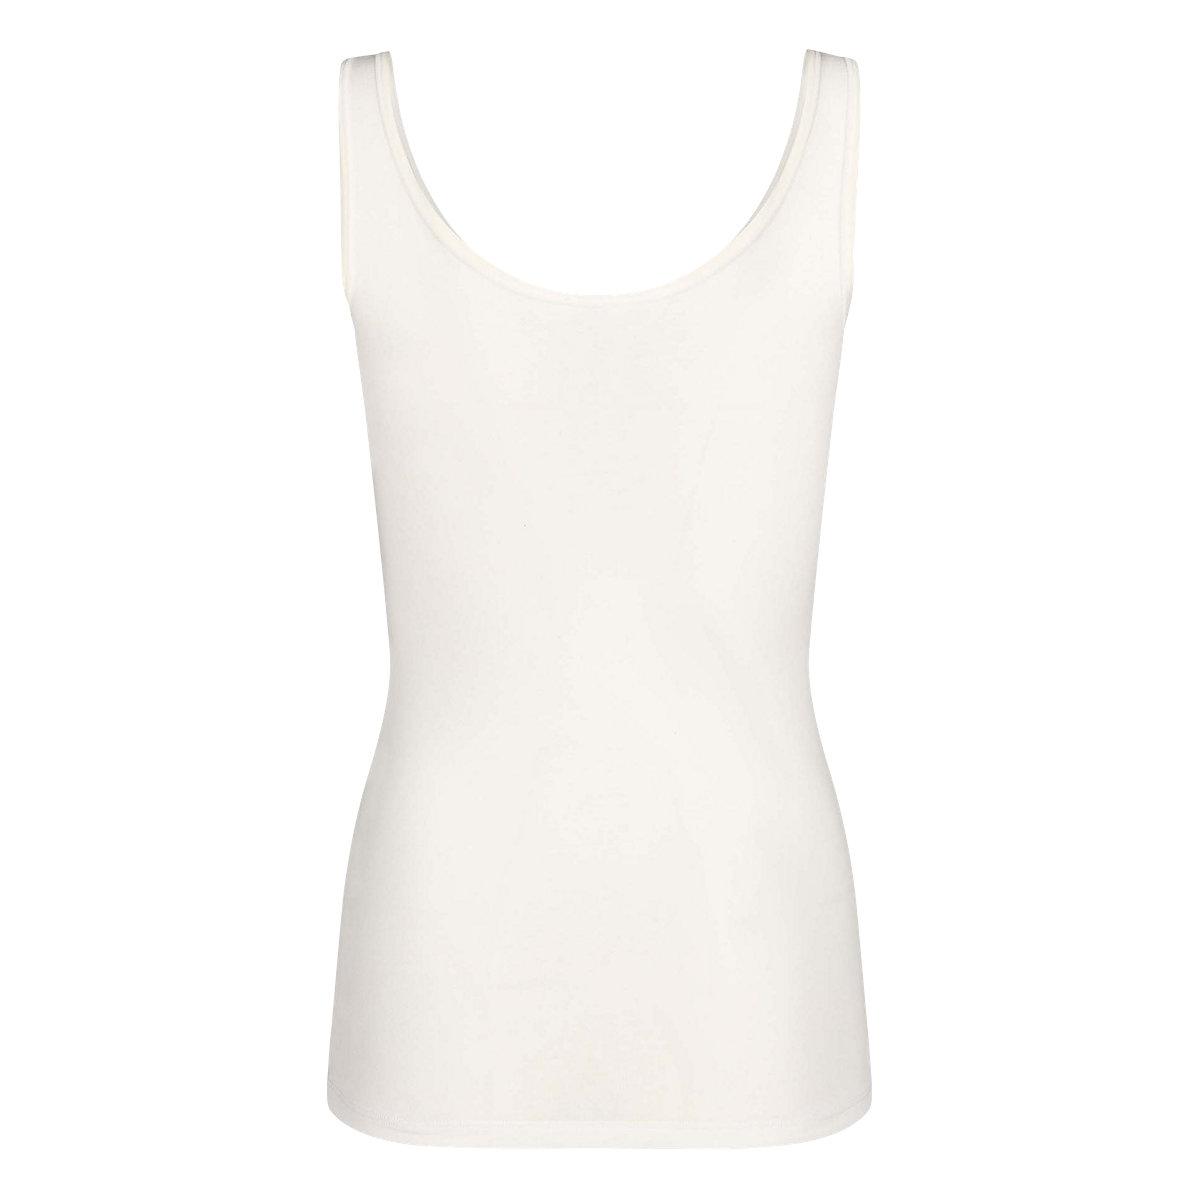 SKINY® Skiny Tank Top Advantage Cotton im 2er Pack Unterhemden gelb